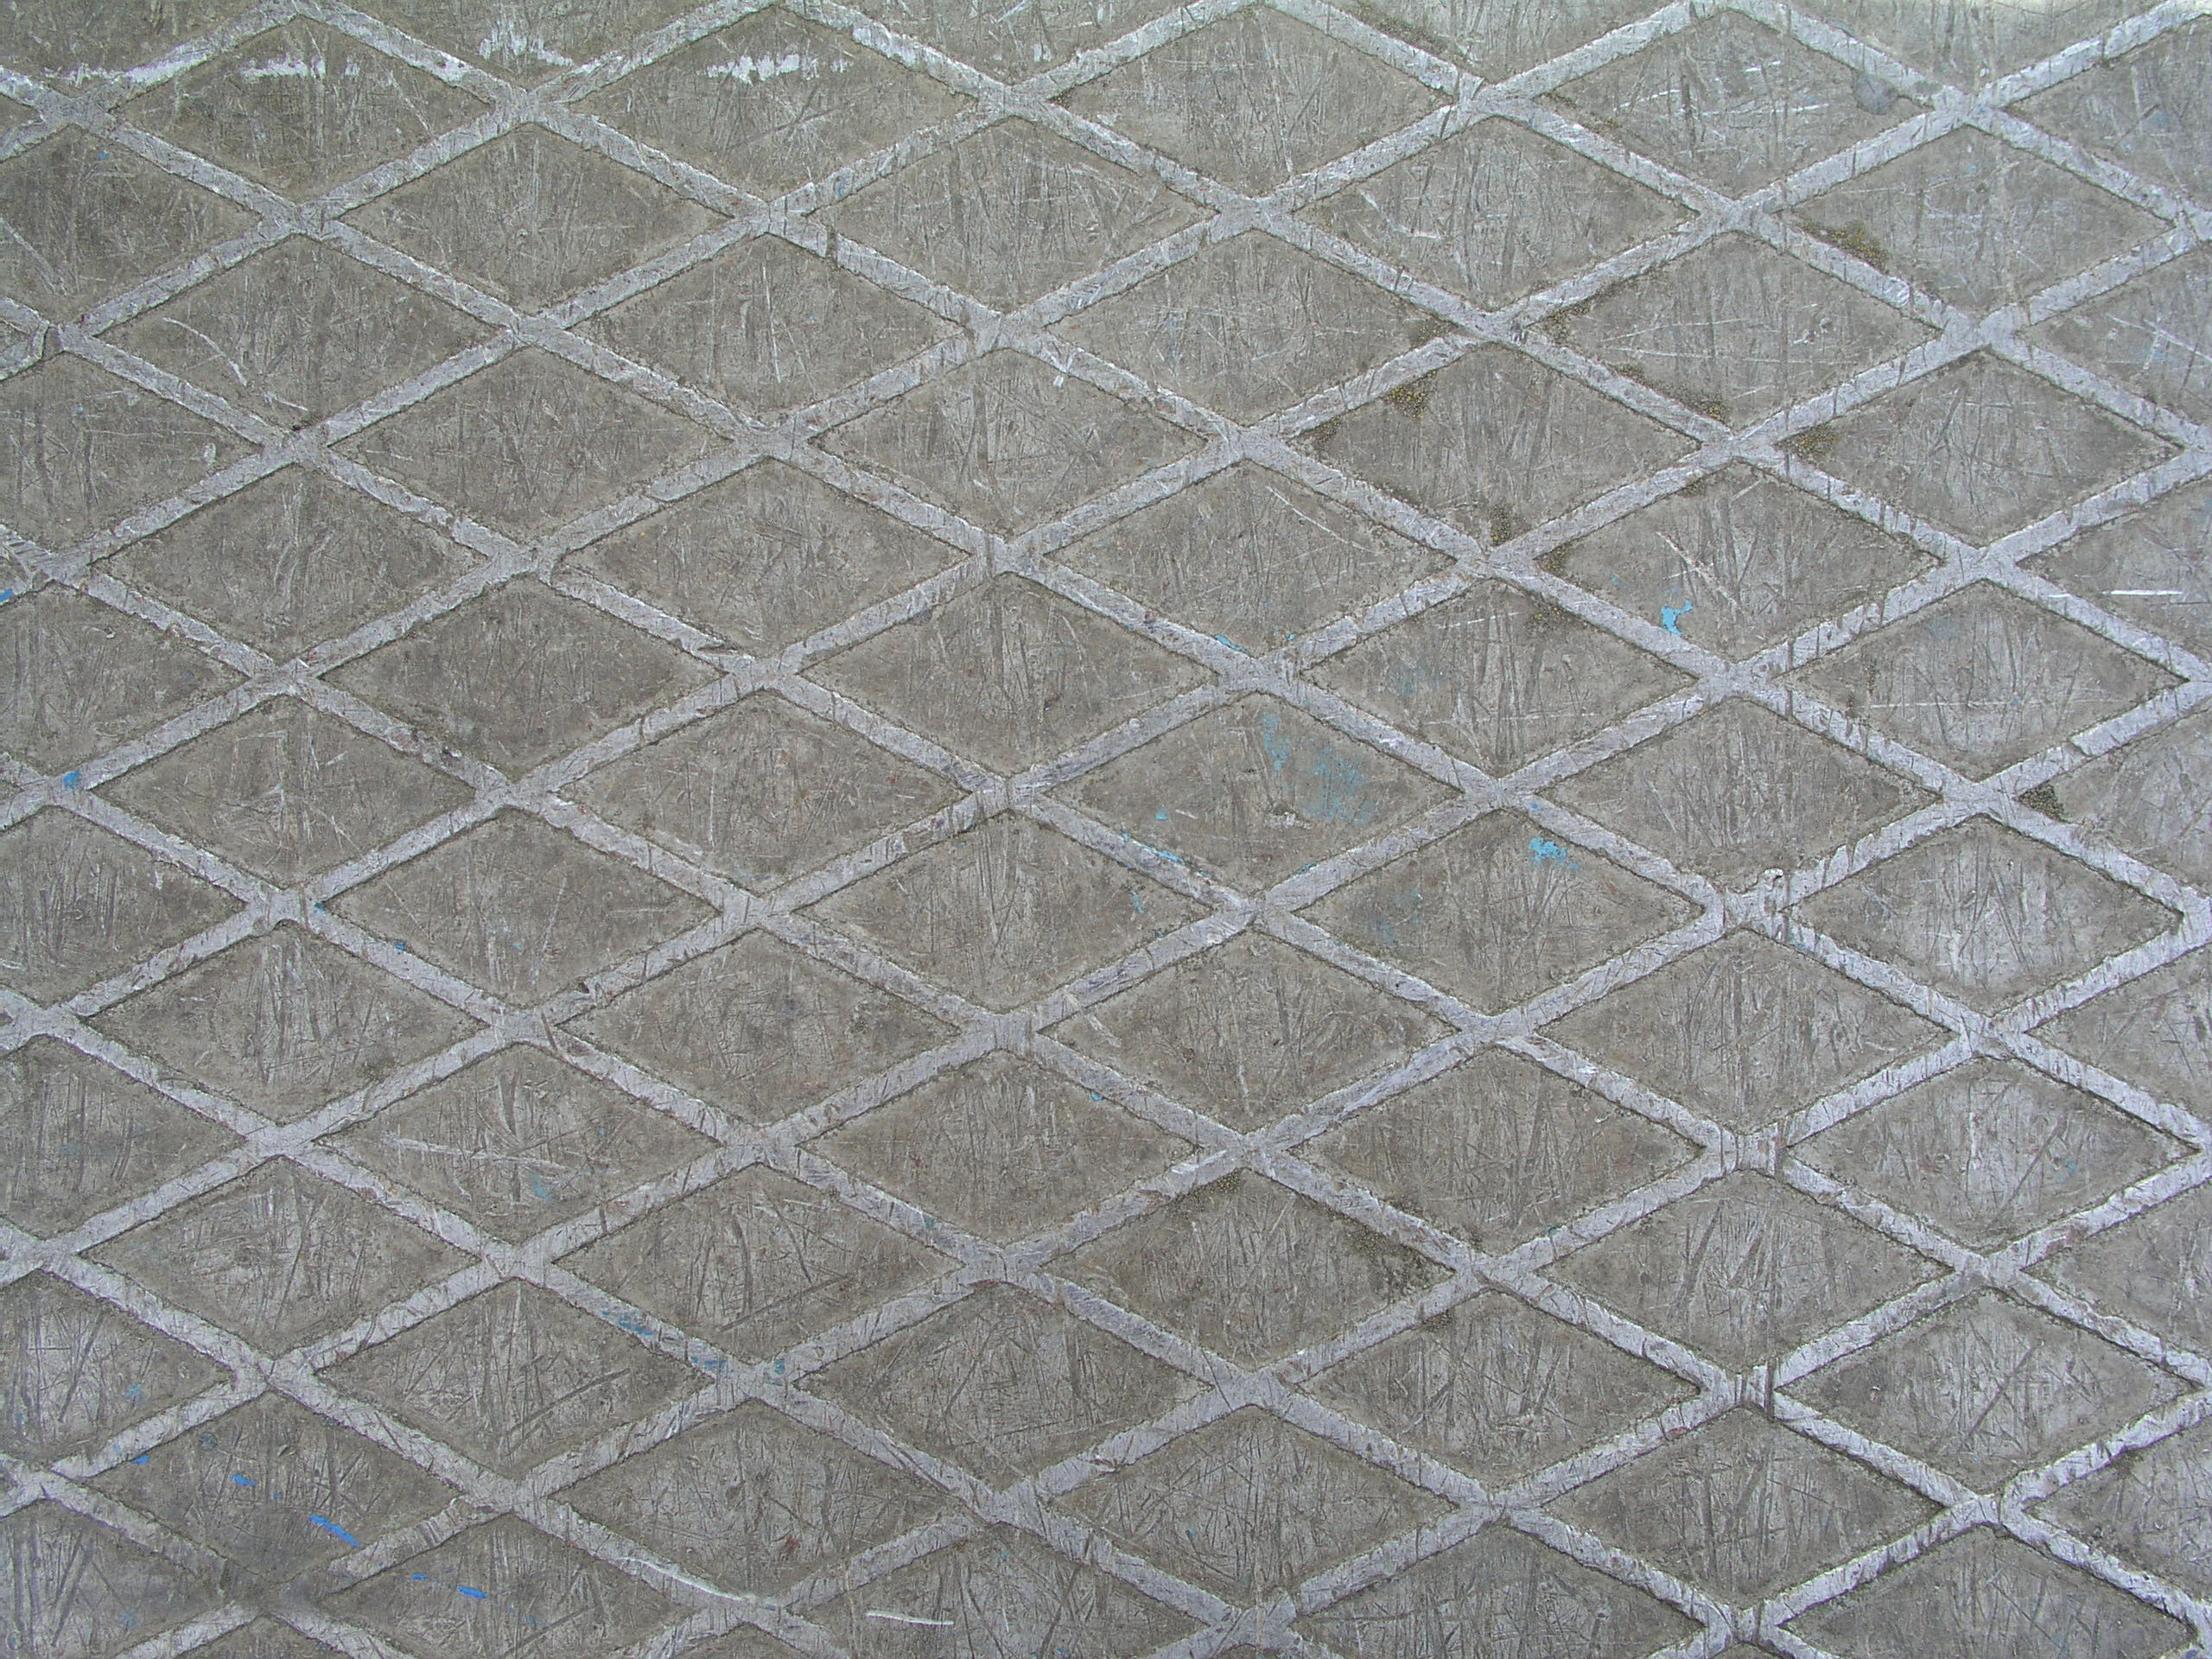 leaf metal, , download photo, background, metal texture